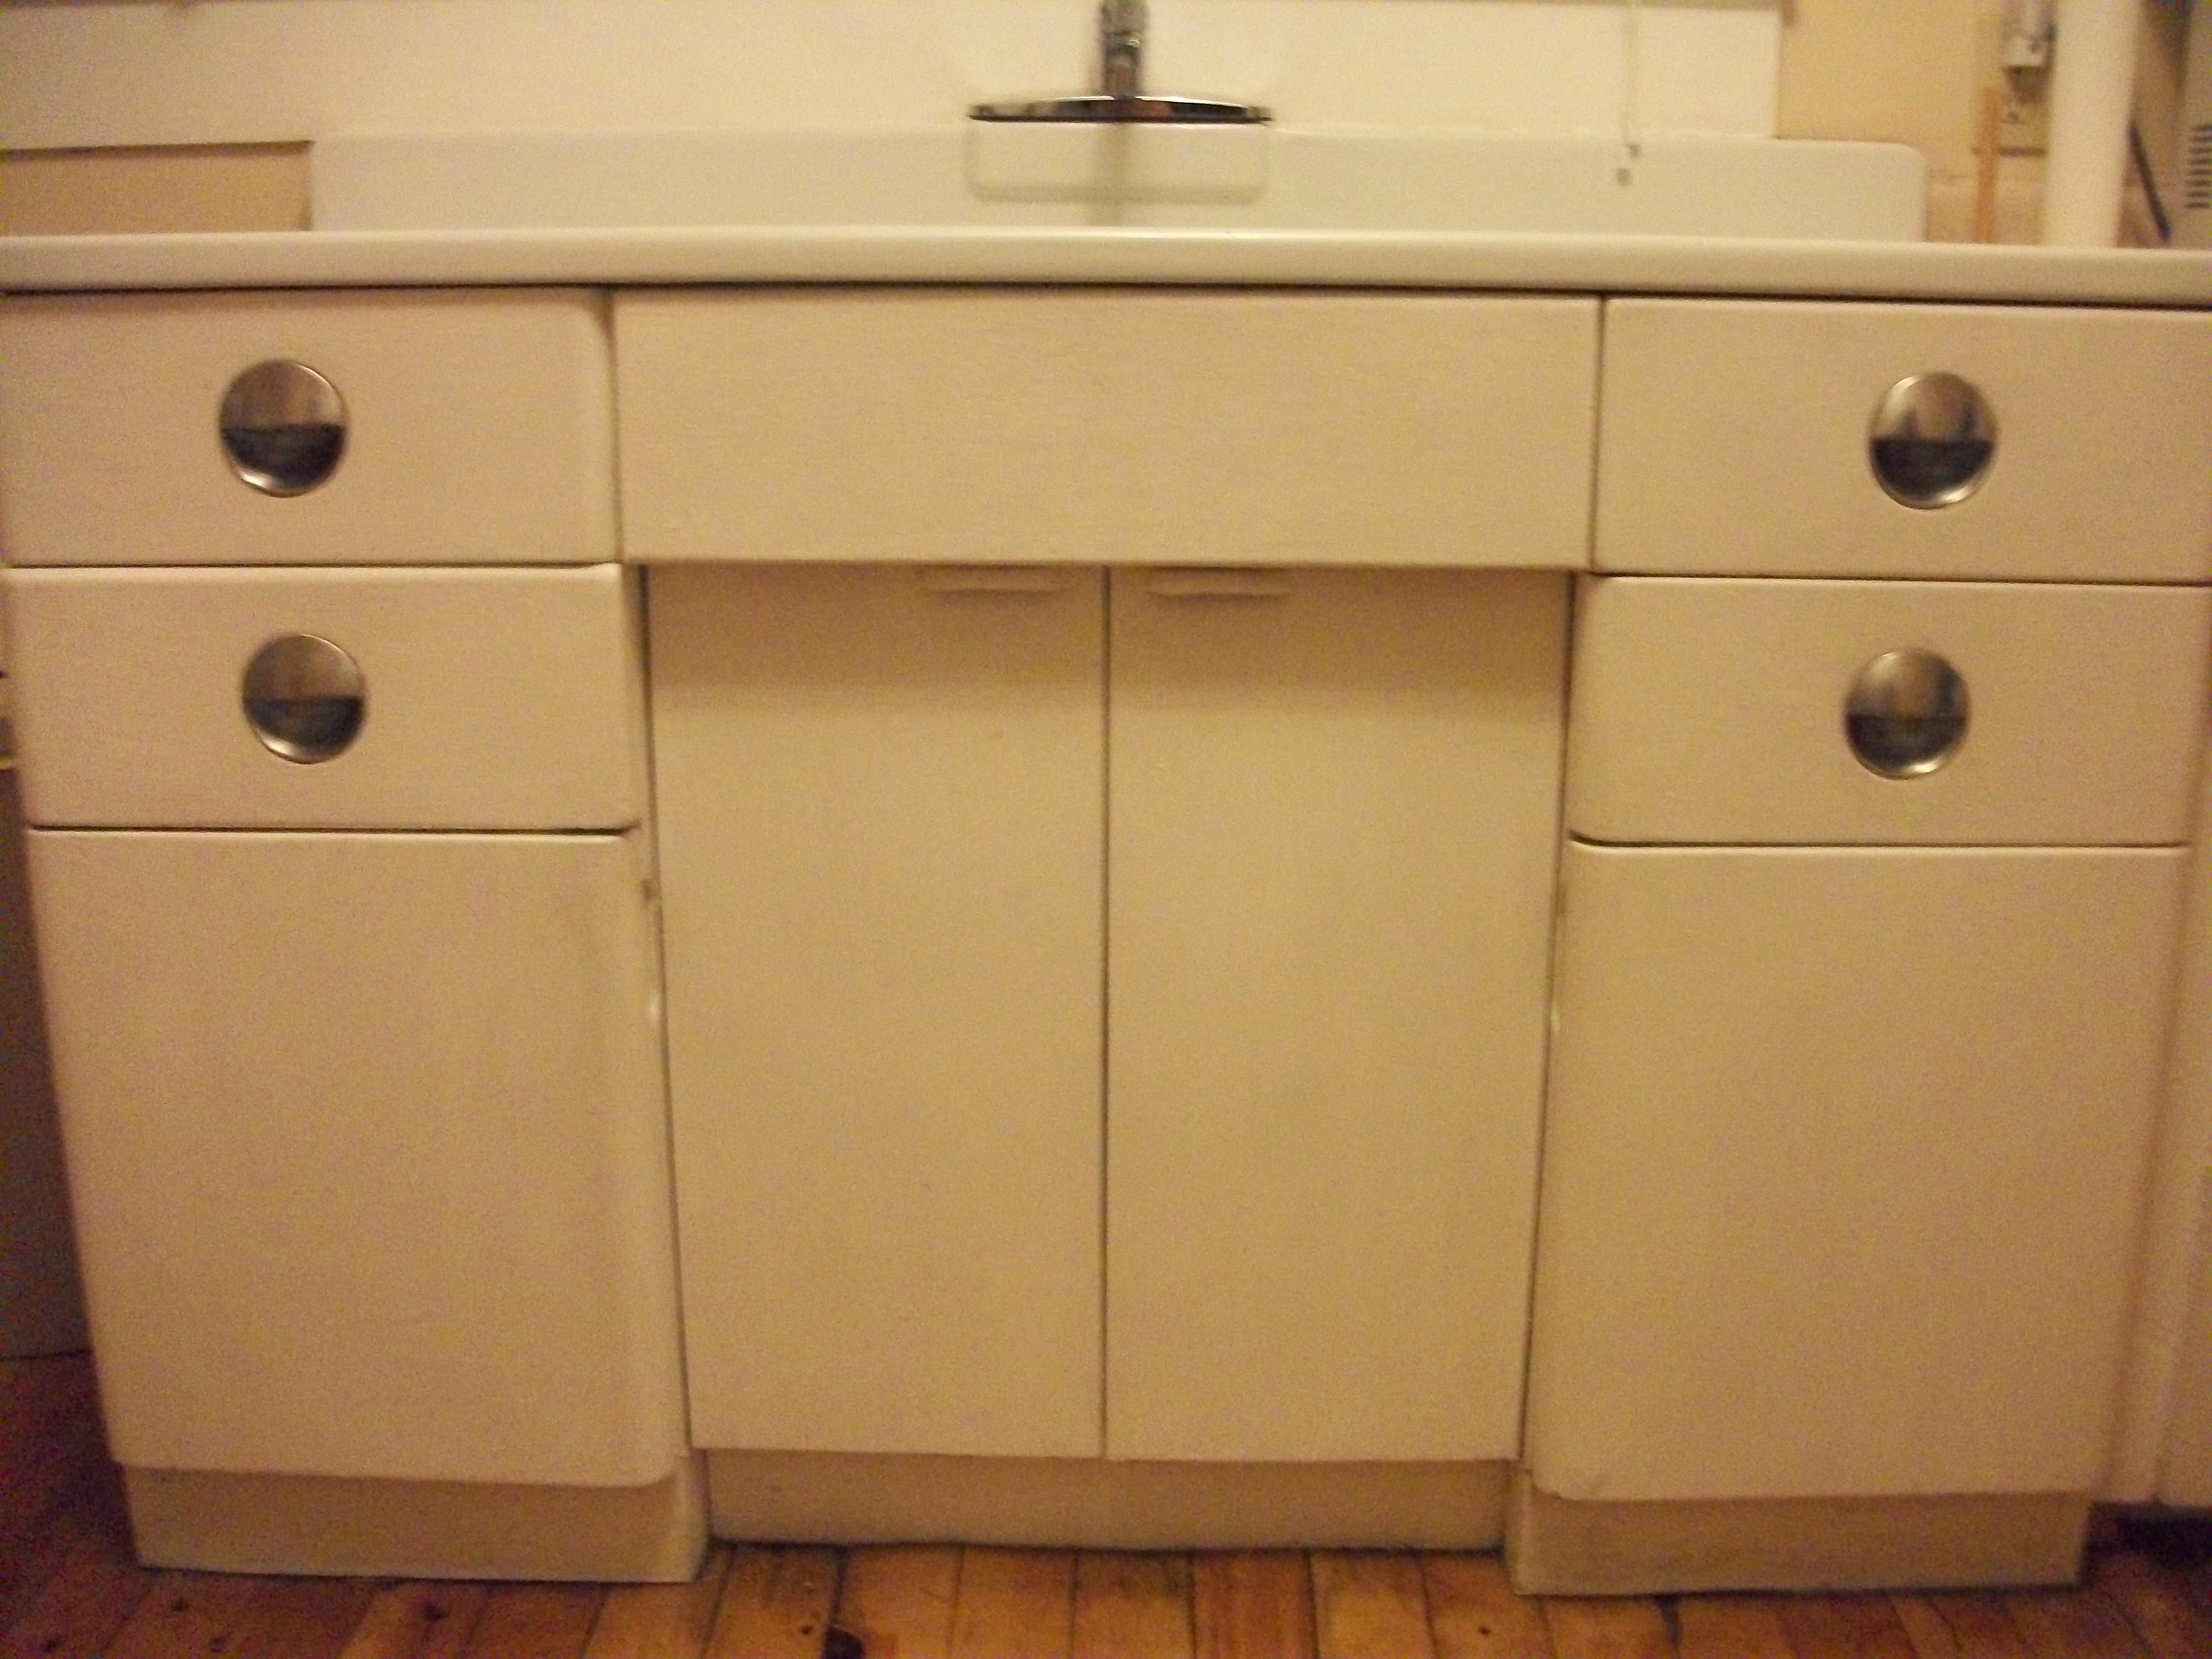 Antique Metal Kitchen Cabinet and Porcelain Sink kitchen cabinets for sale Metal Kitchen Cabinet and Porcelain Sink For Sale Antiques com Classifieds